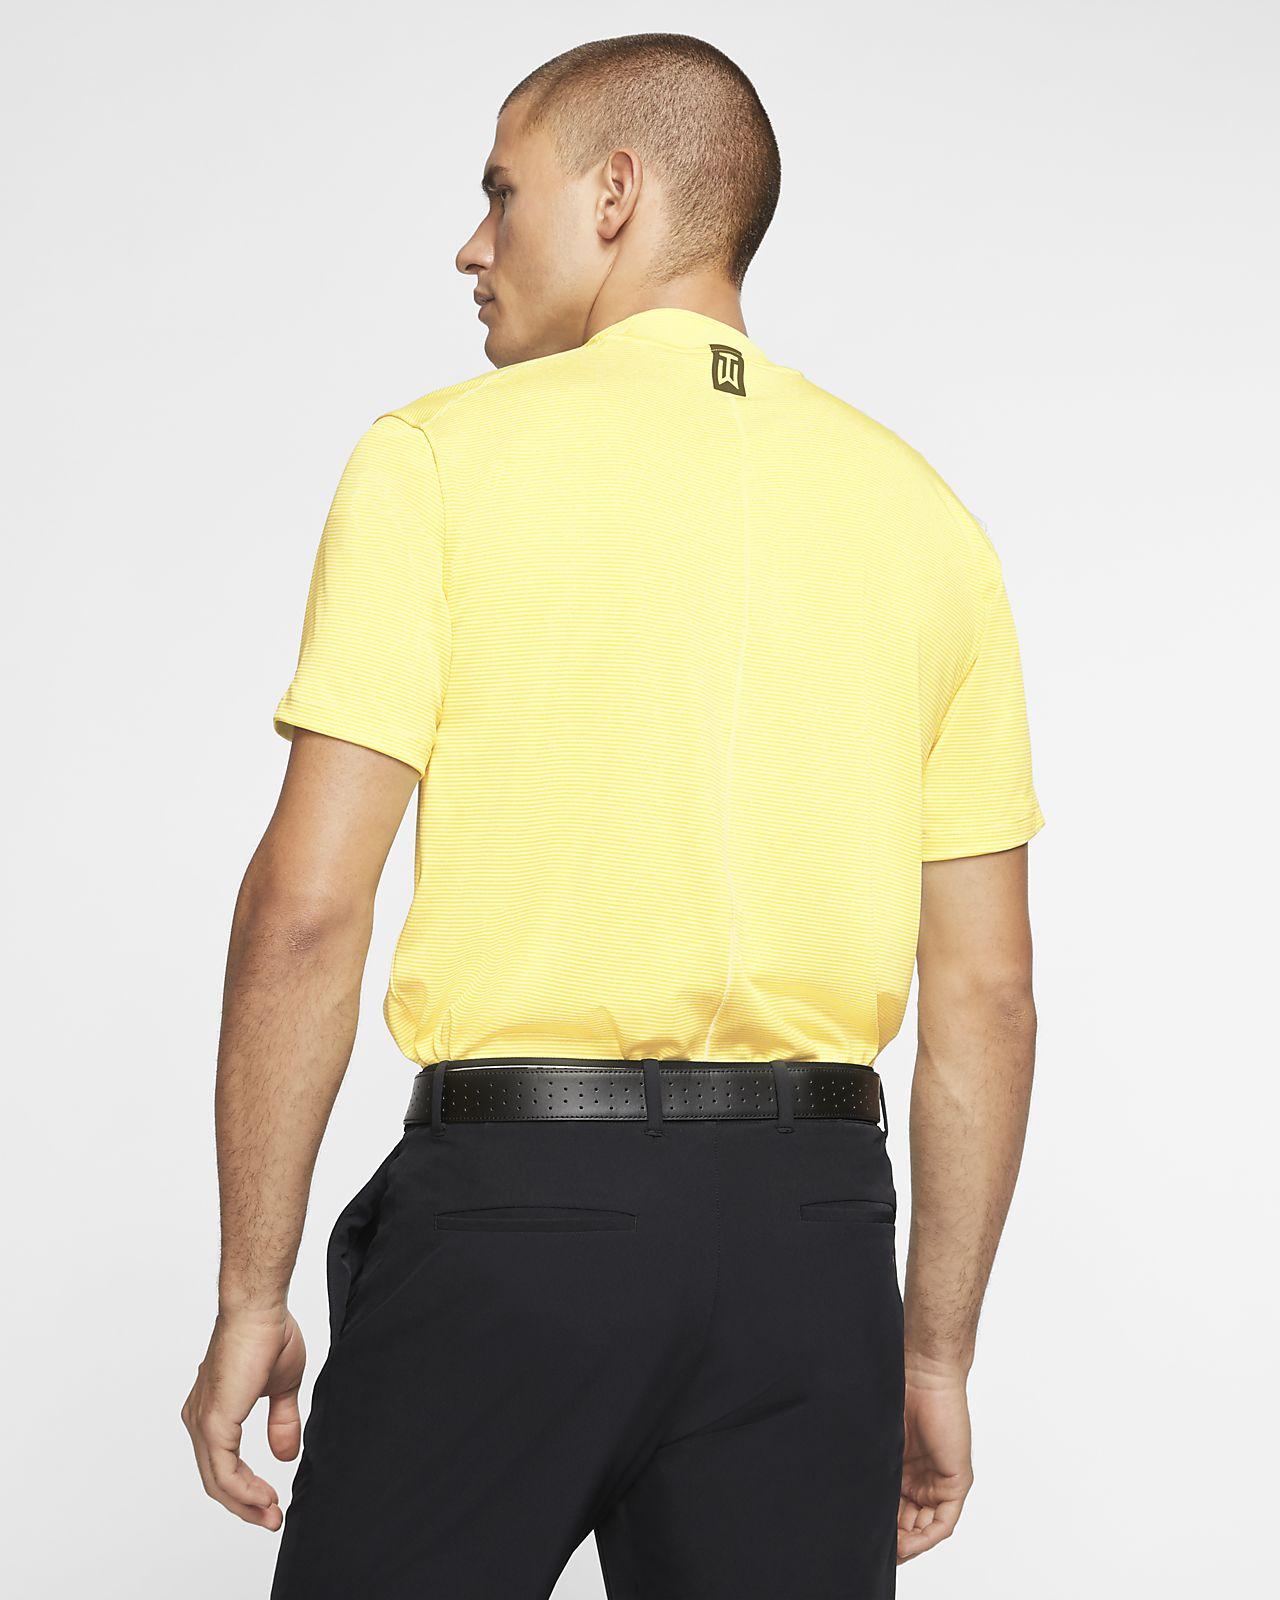 ff1b42ee324a5 Nike Dri-FIT Tiger Woods Vapor Men's Mock-Neck Golf Top. Nike.com